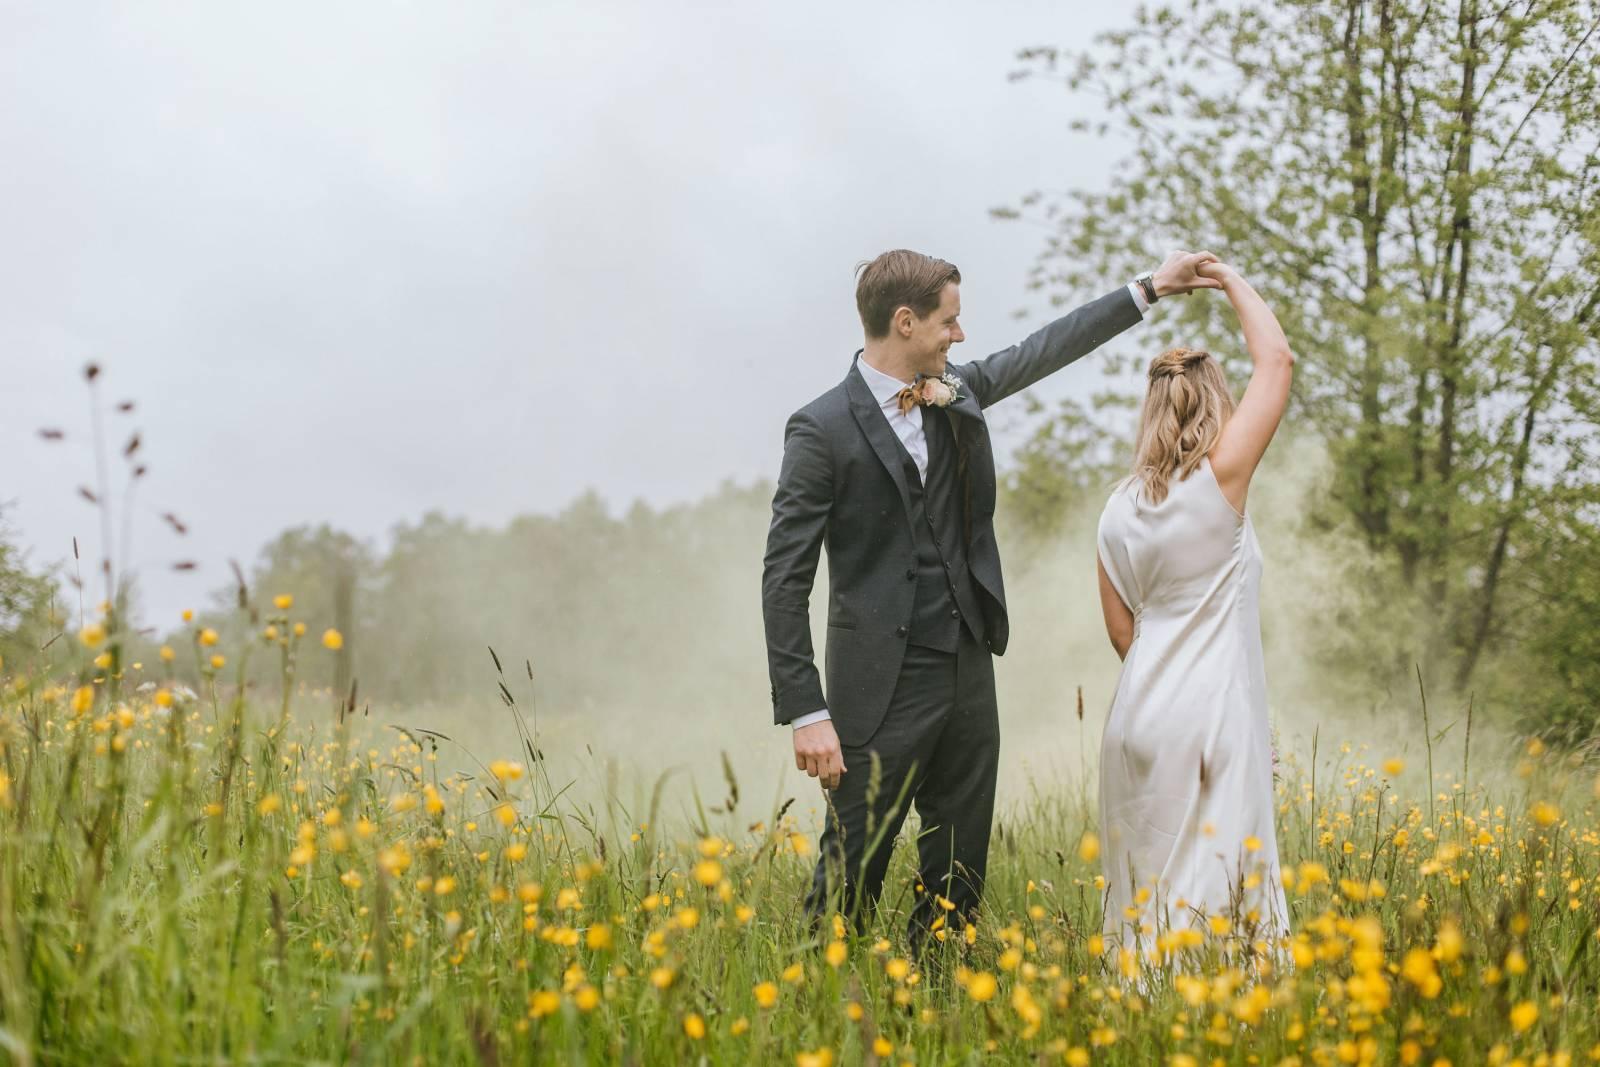 Alissia Porez - XIM_1675 2 - Model Heike Bazijn - Fotograaf Lux Visual Storytellers - House of Weddings 3